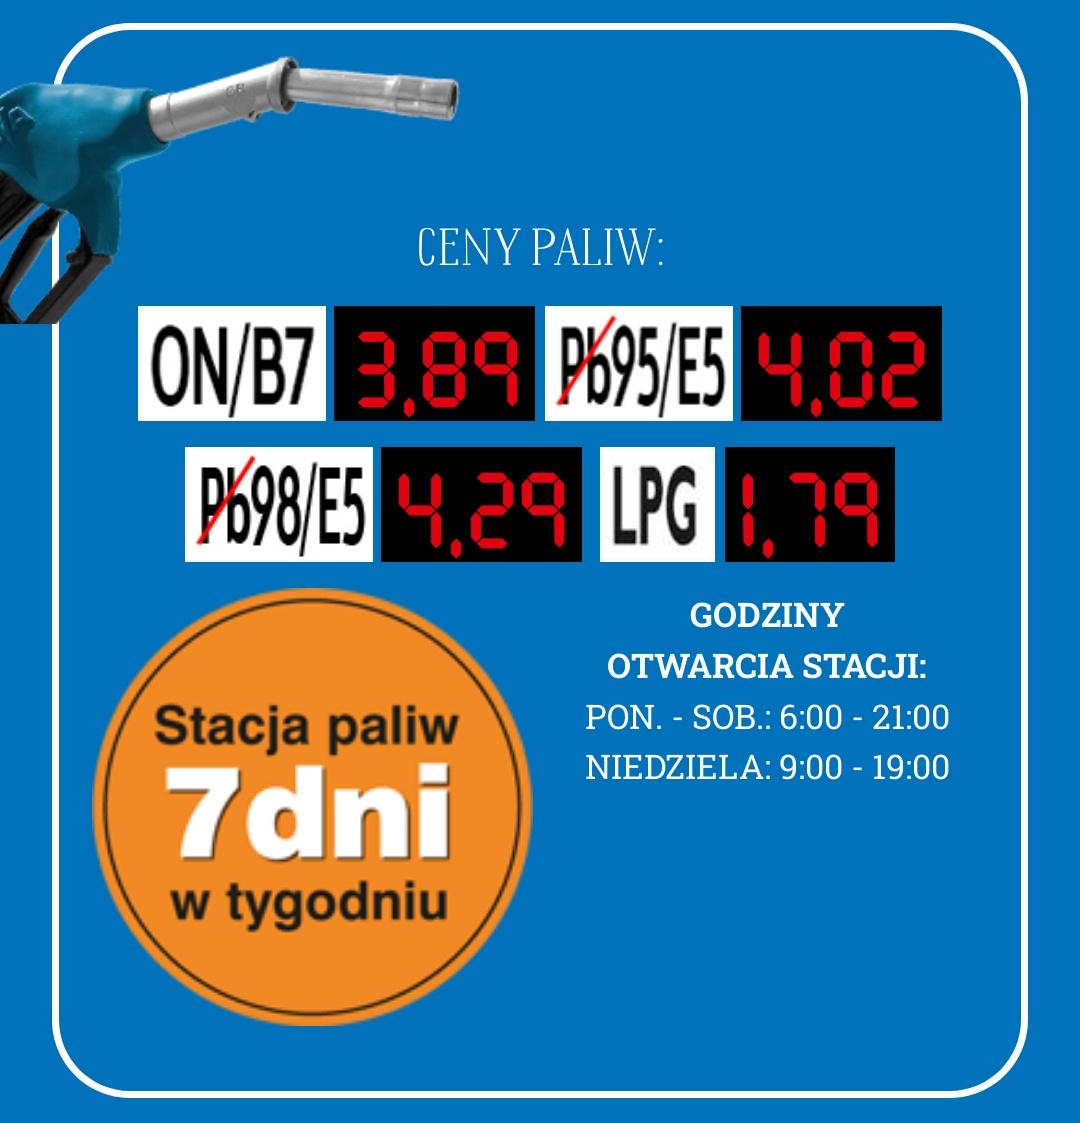 Pb95 4.02, ON 3.89, Pb98 4.29, LPG 1.79 E.Leclerc Mielec, Powstańców Warszawy 4